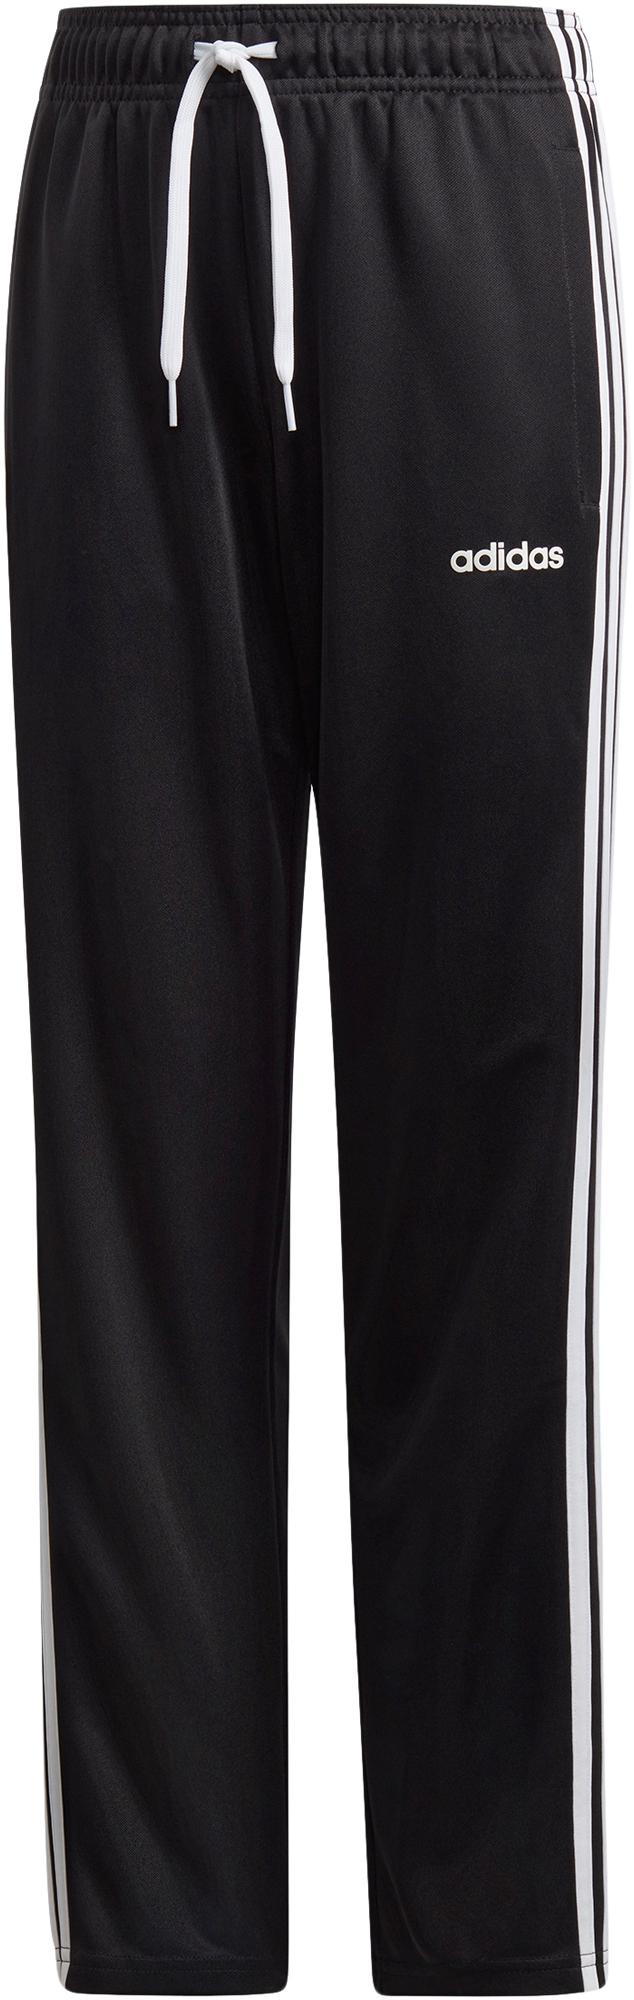 Adidas Брюки для мальчиков Essentials 3-Stripes, размер 170